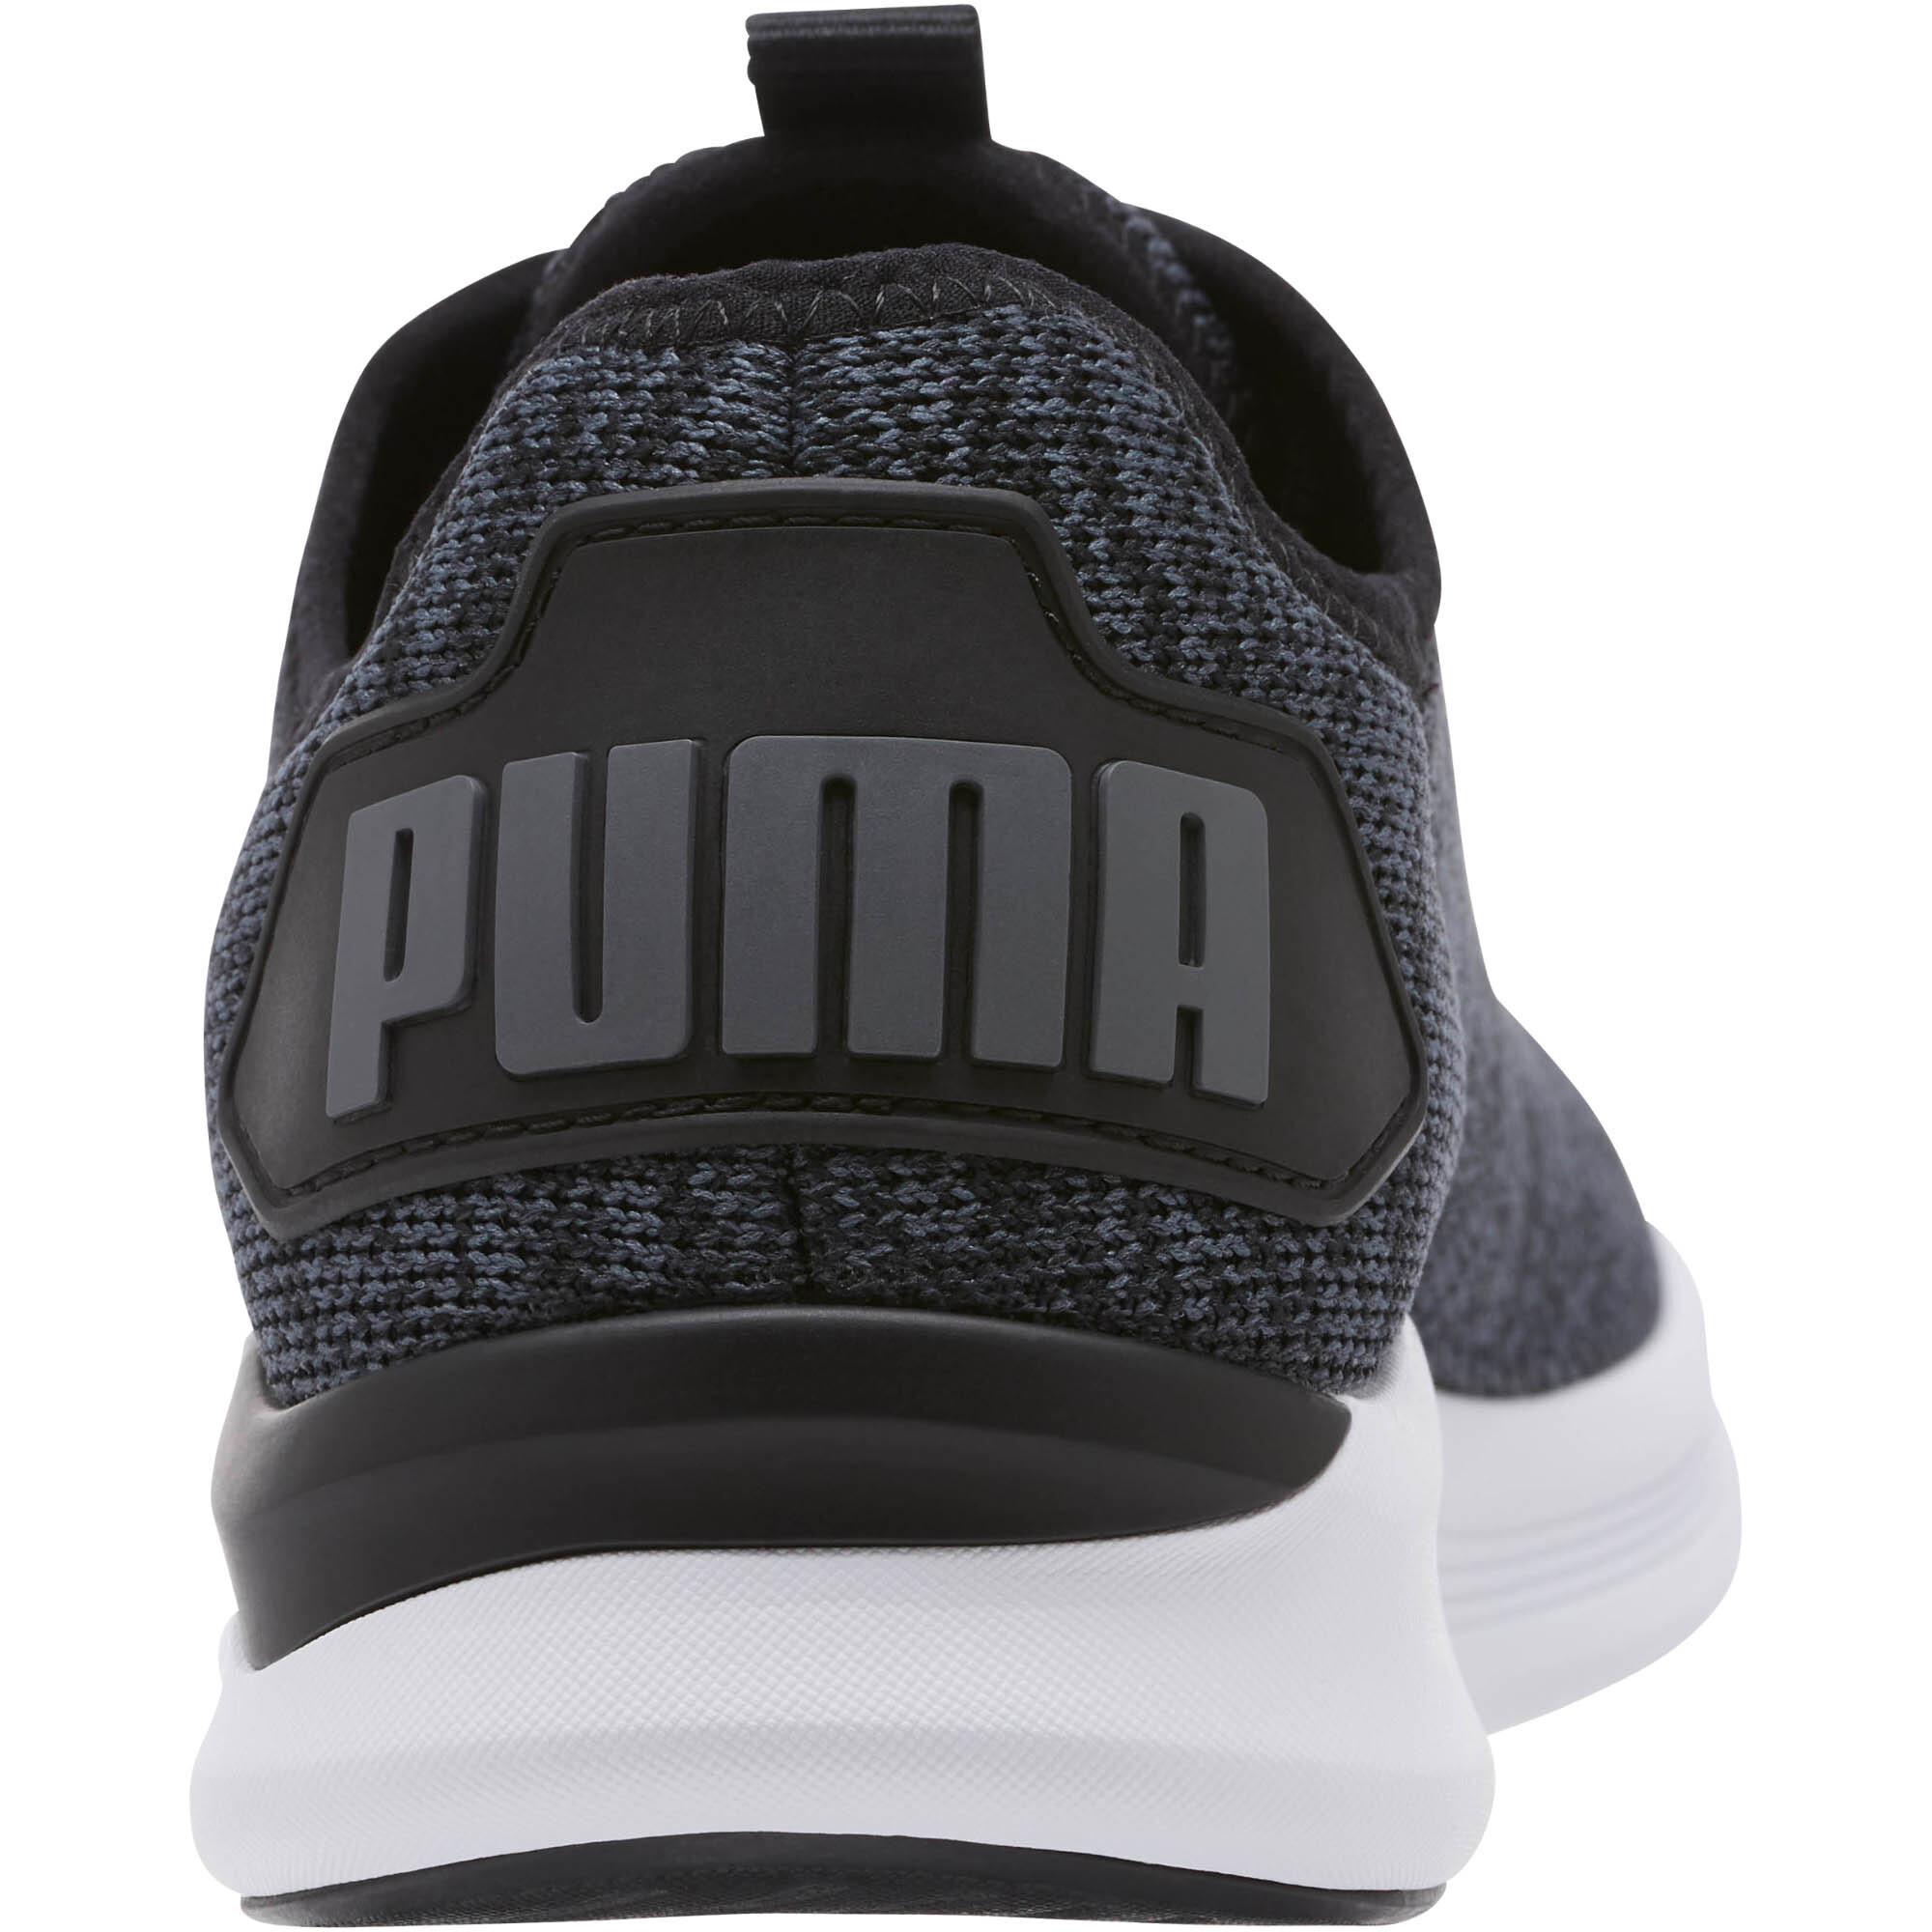 PUMA-Ballast-Women-039-s-Running-Shoes-Women-Shoe-Running thumbnail 3